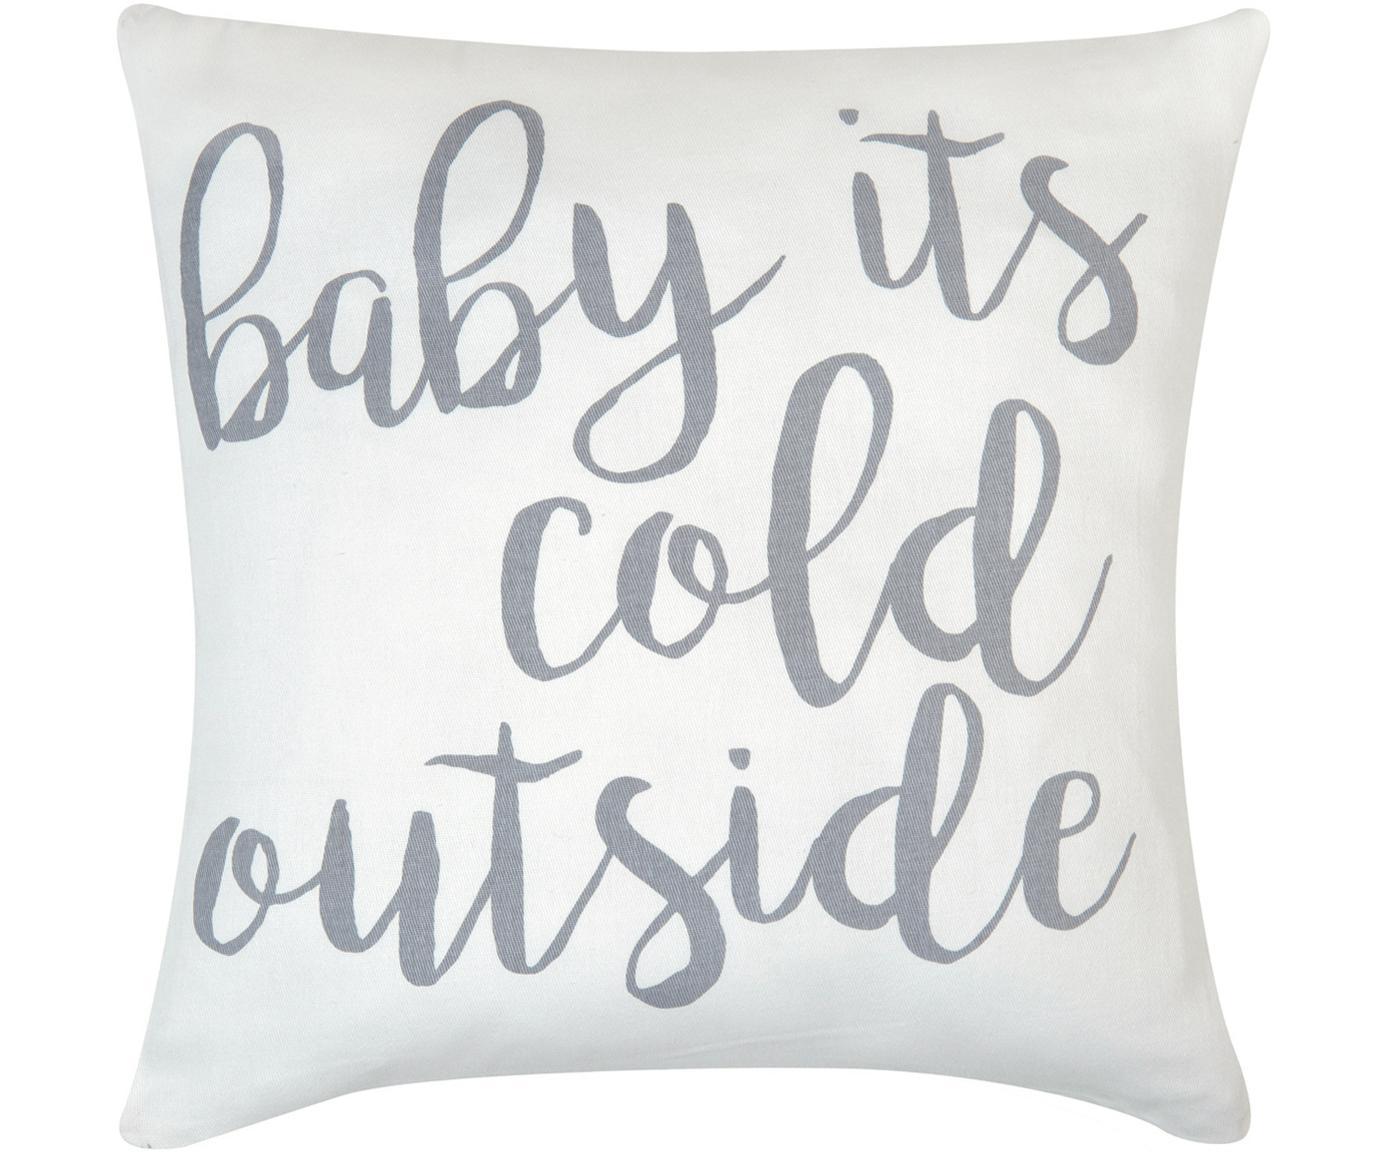 Funda de cojín Cold Outside, 100%algodón, tela Panamá, Gris, crudo, An 40 x L 40 cm